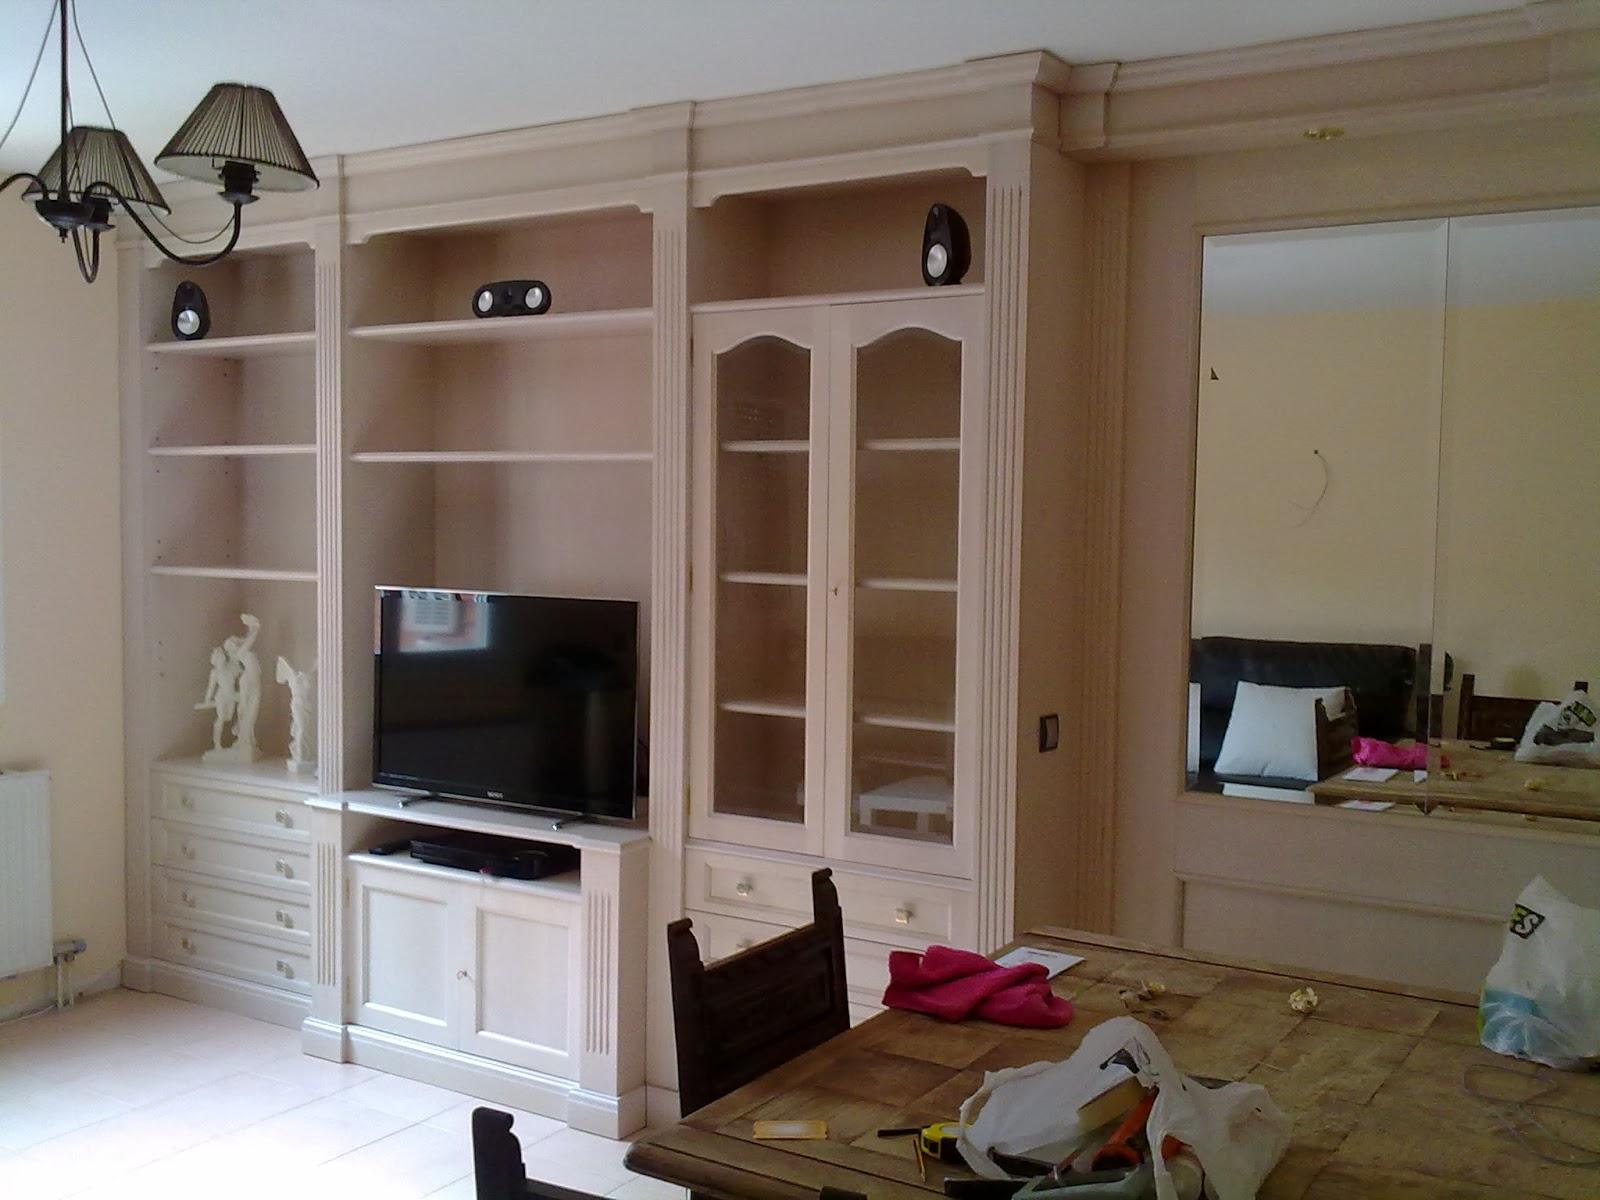 Boisseries muebles a medida fabritecma - Muebles a medida en madrid ...